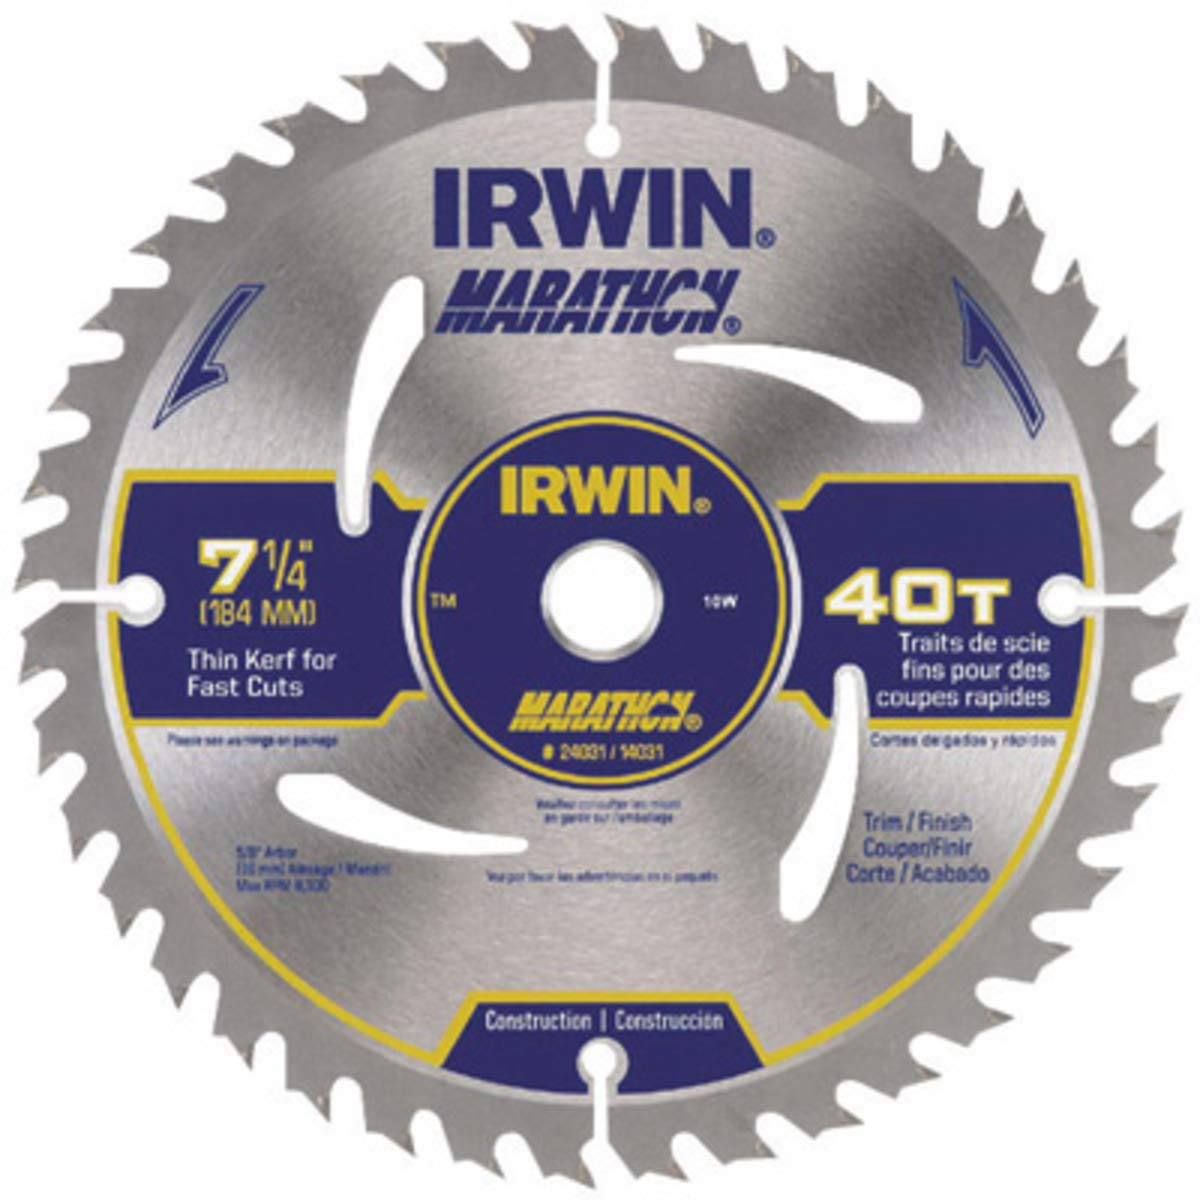 IRWIN 7 1/4'' X 5/8'' Diamond X .047'' 8300 RPM 40 Teeth ATB Grind Vise,Grip Marathon Carbide Tipped Portable Corded Circular Saw Blade (For Wood Cutting) (Carded),5 Each